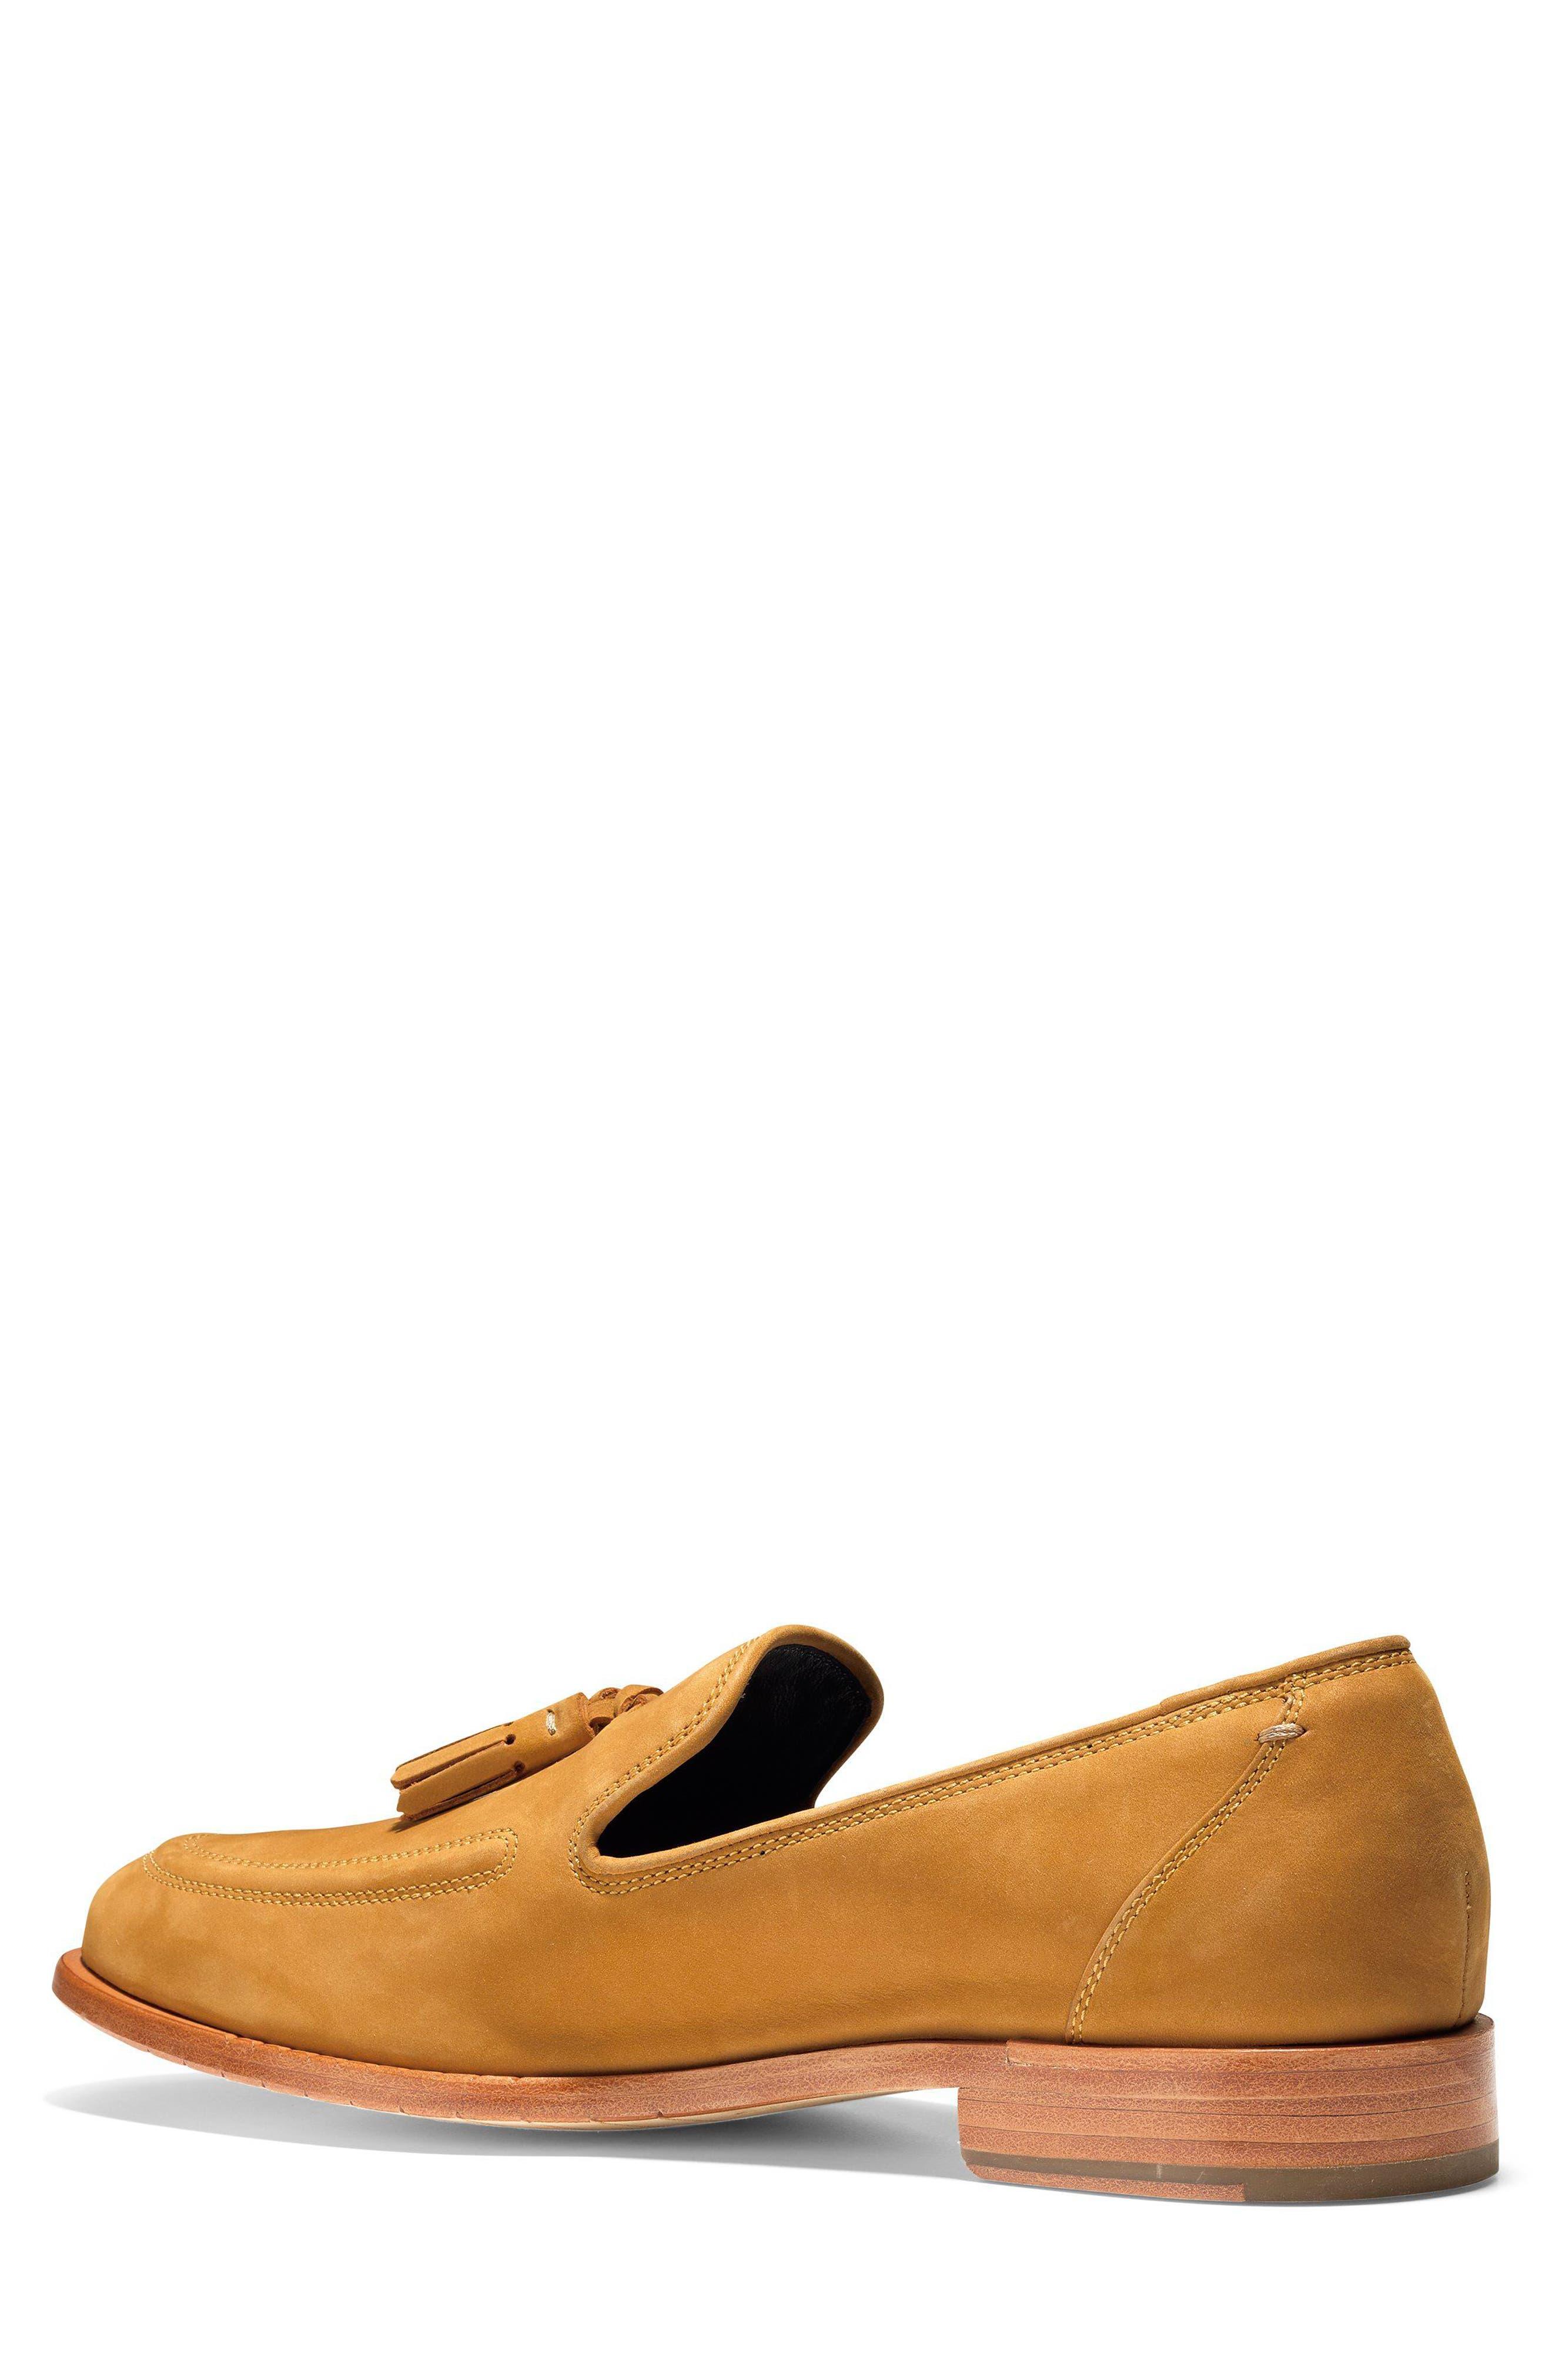 Washington Grand Tassel Loafer,                             Alternate thumbnail 6, color,